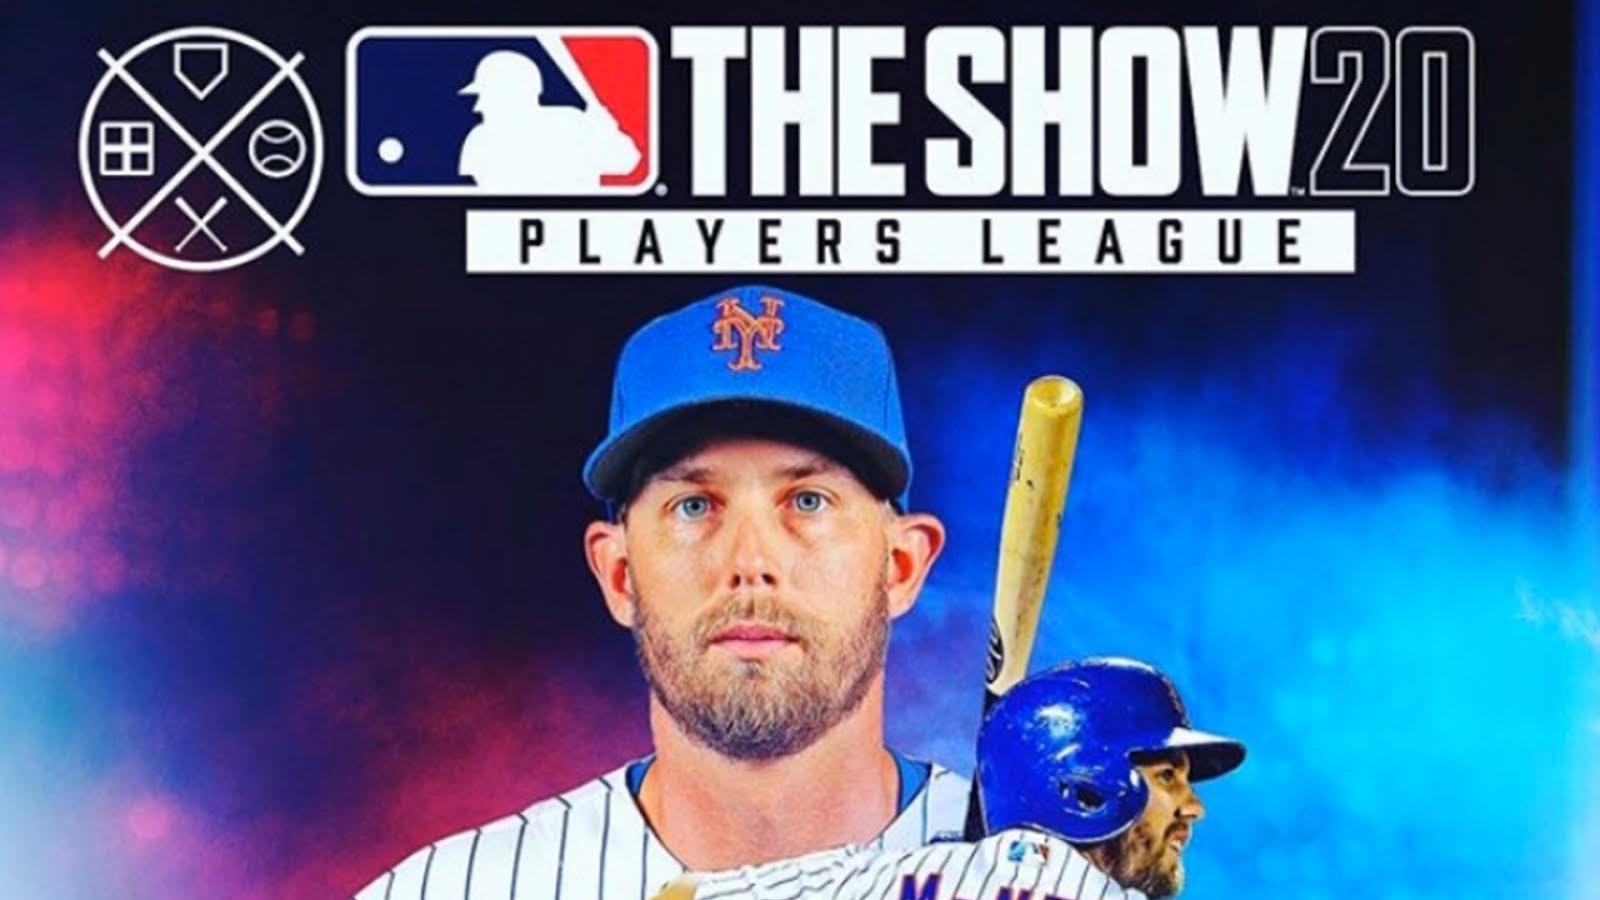 Players League